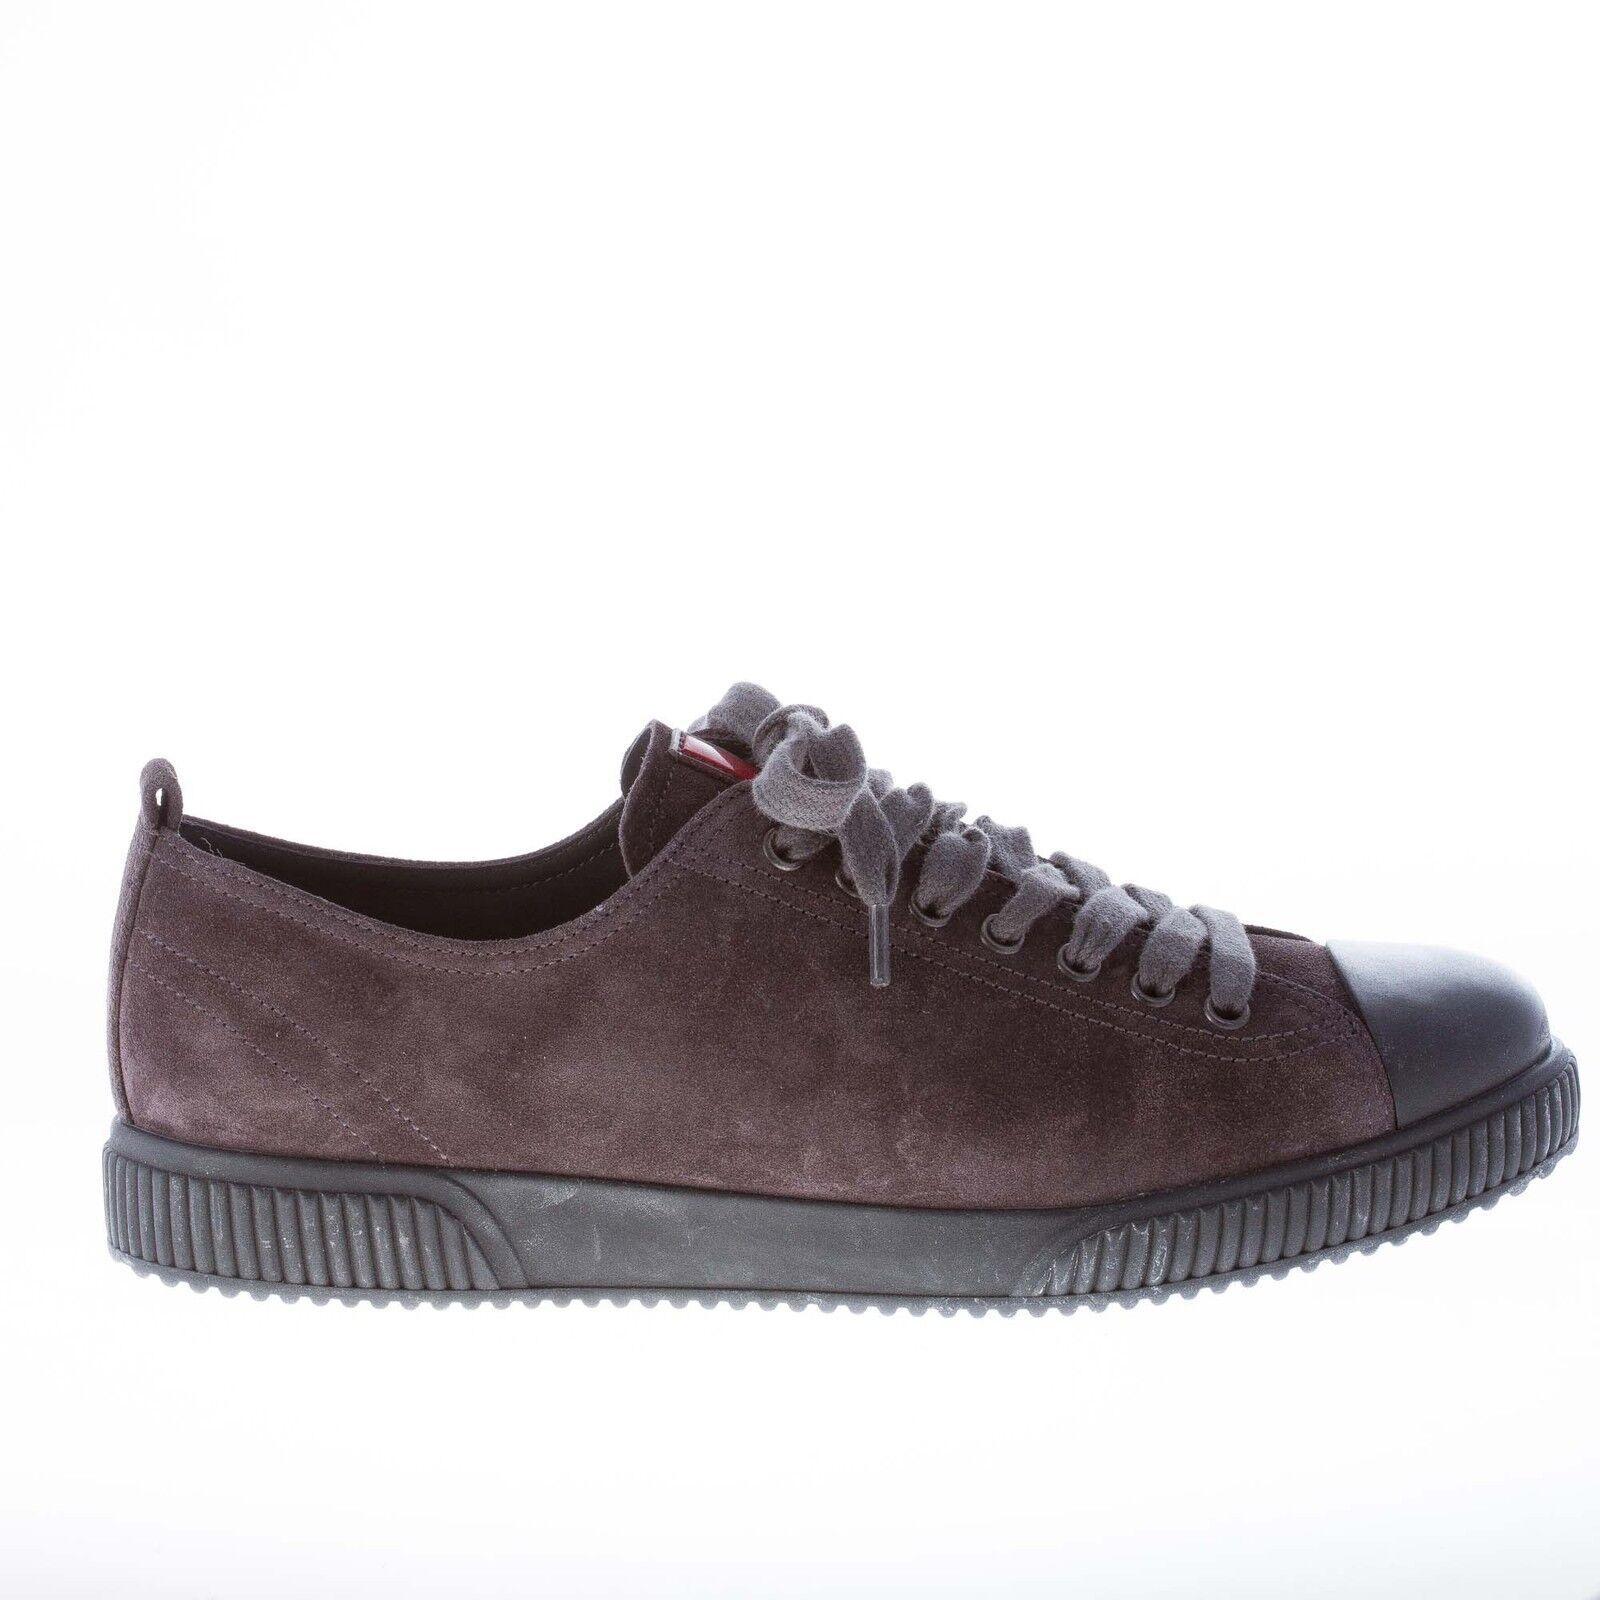 PRADA herren schuhe lace men schuhe Grau suede lace schuhe sneaker with rubber reinforced toe 092954